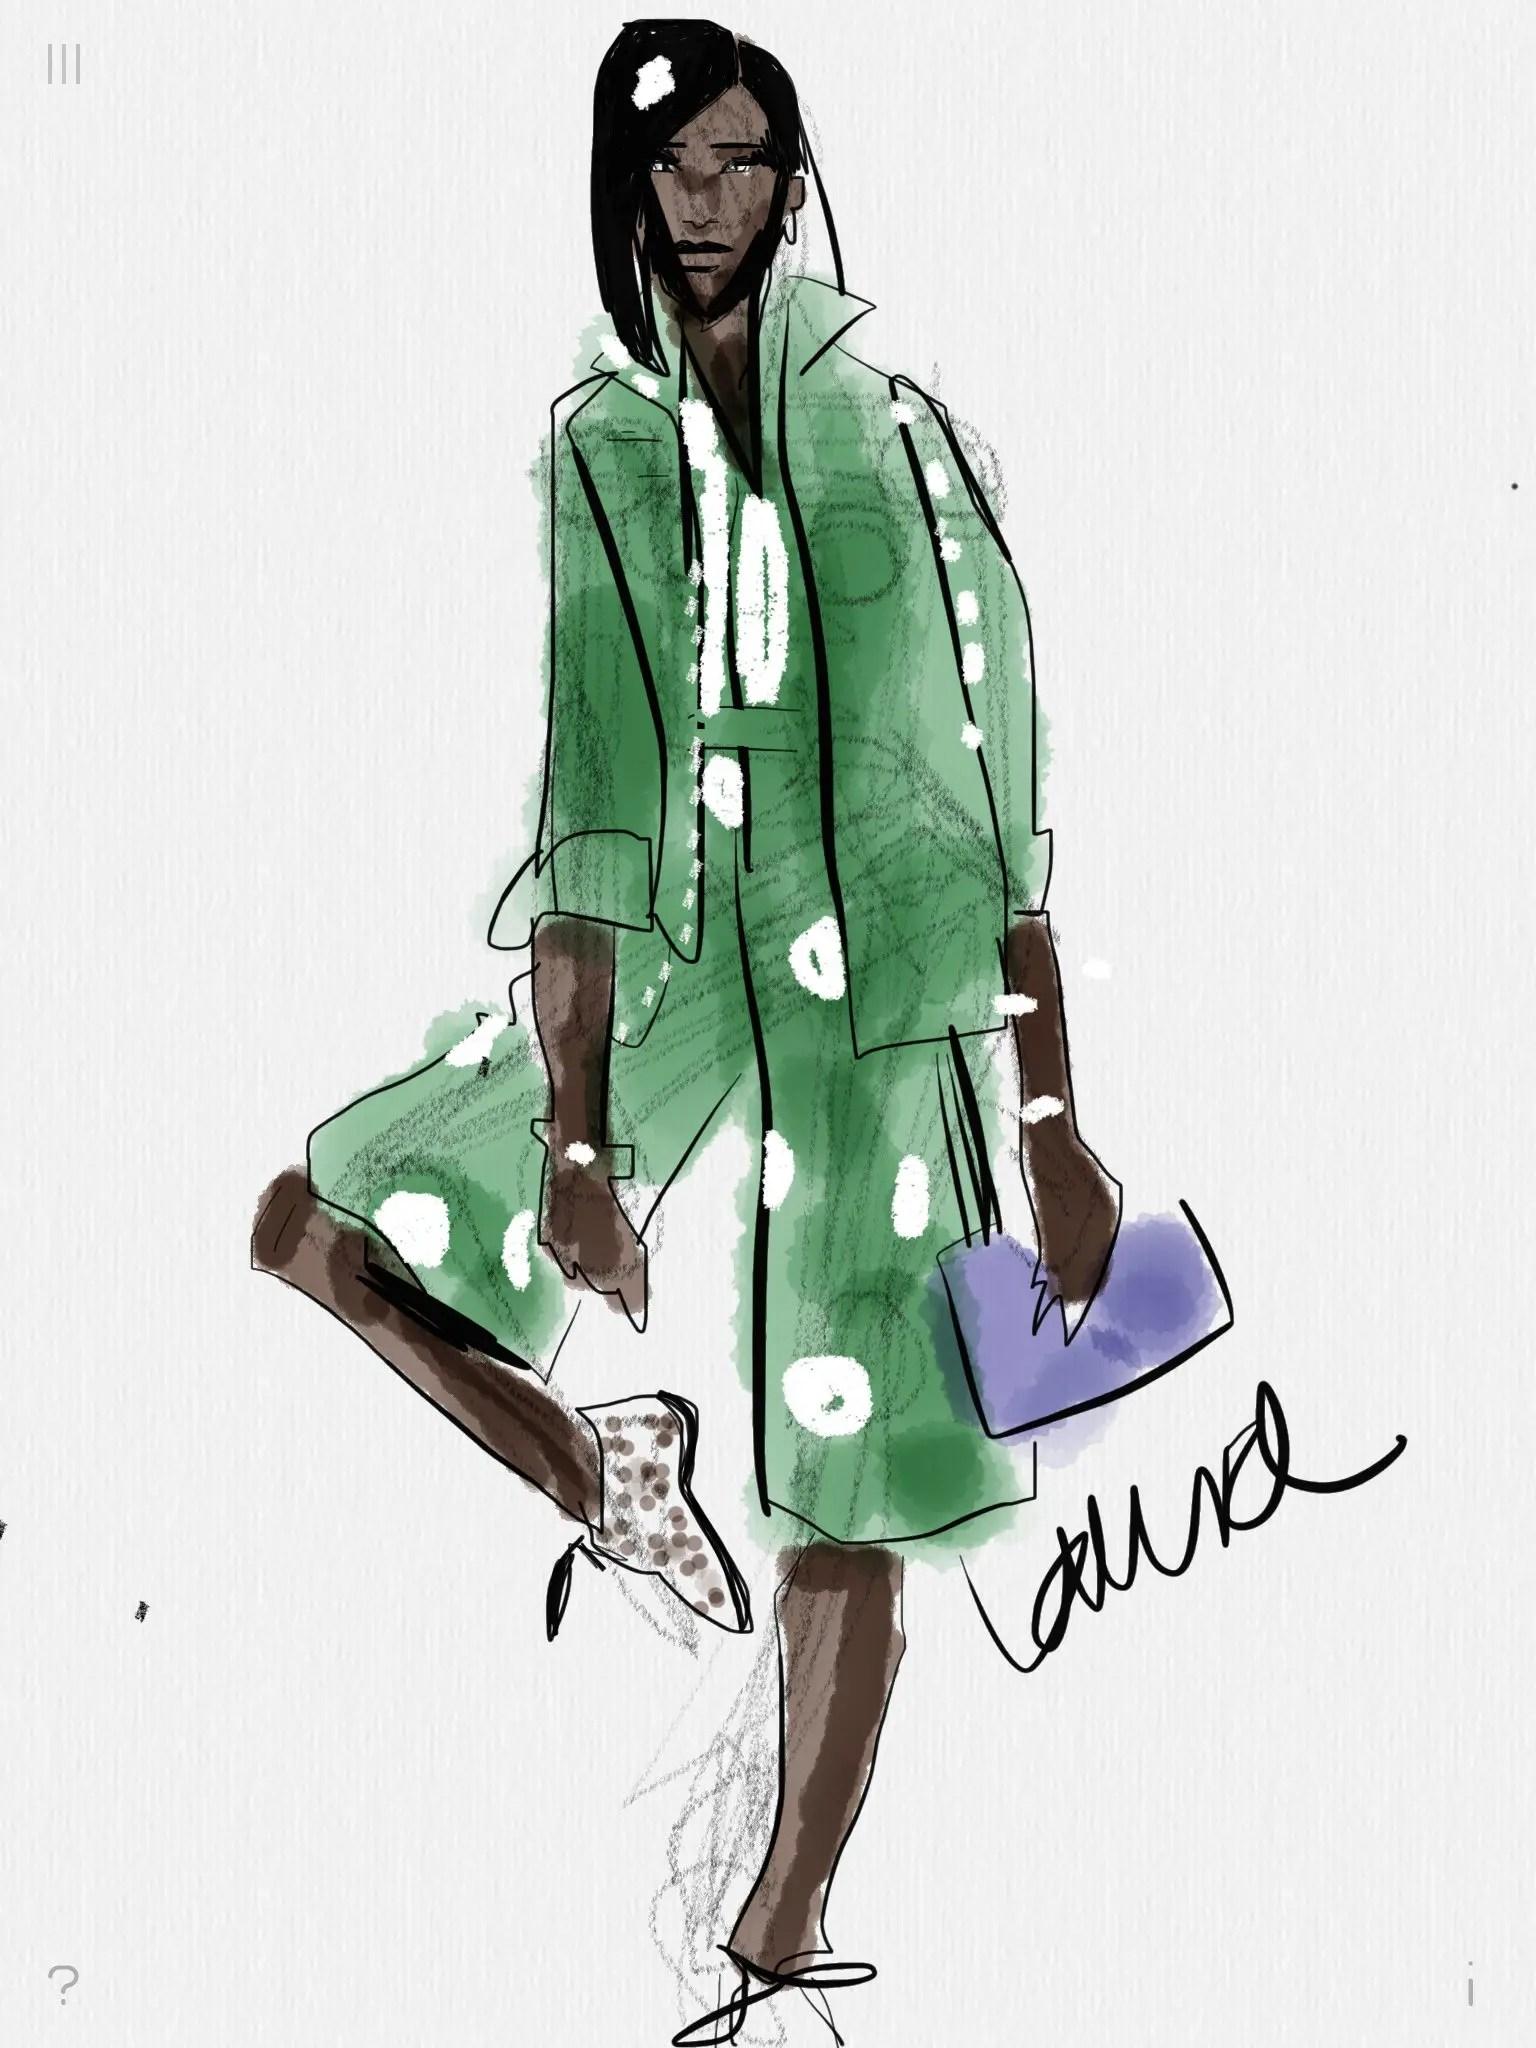 Digital Fashion Sketching With Tayasui Sketches App On Ipad Or Digital Device